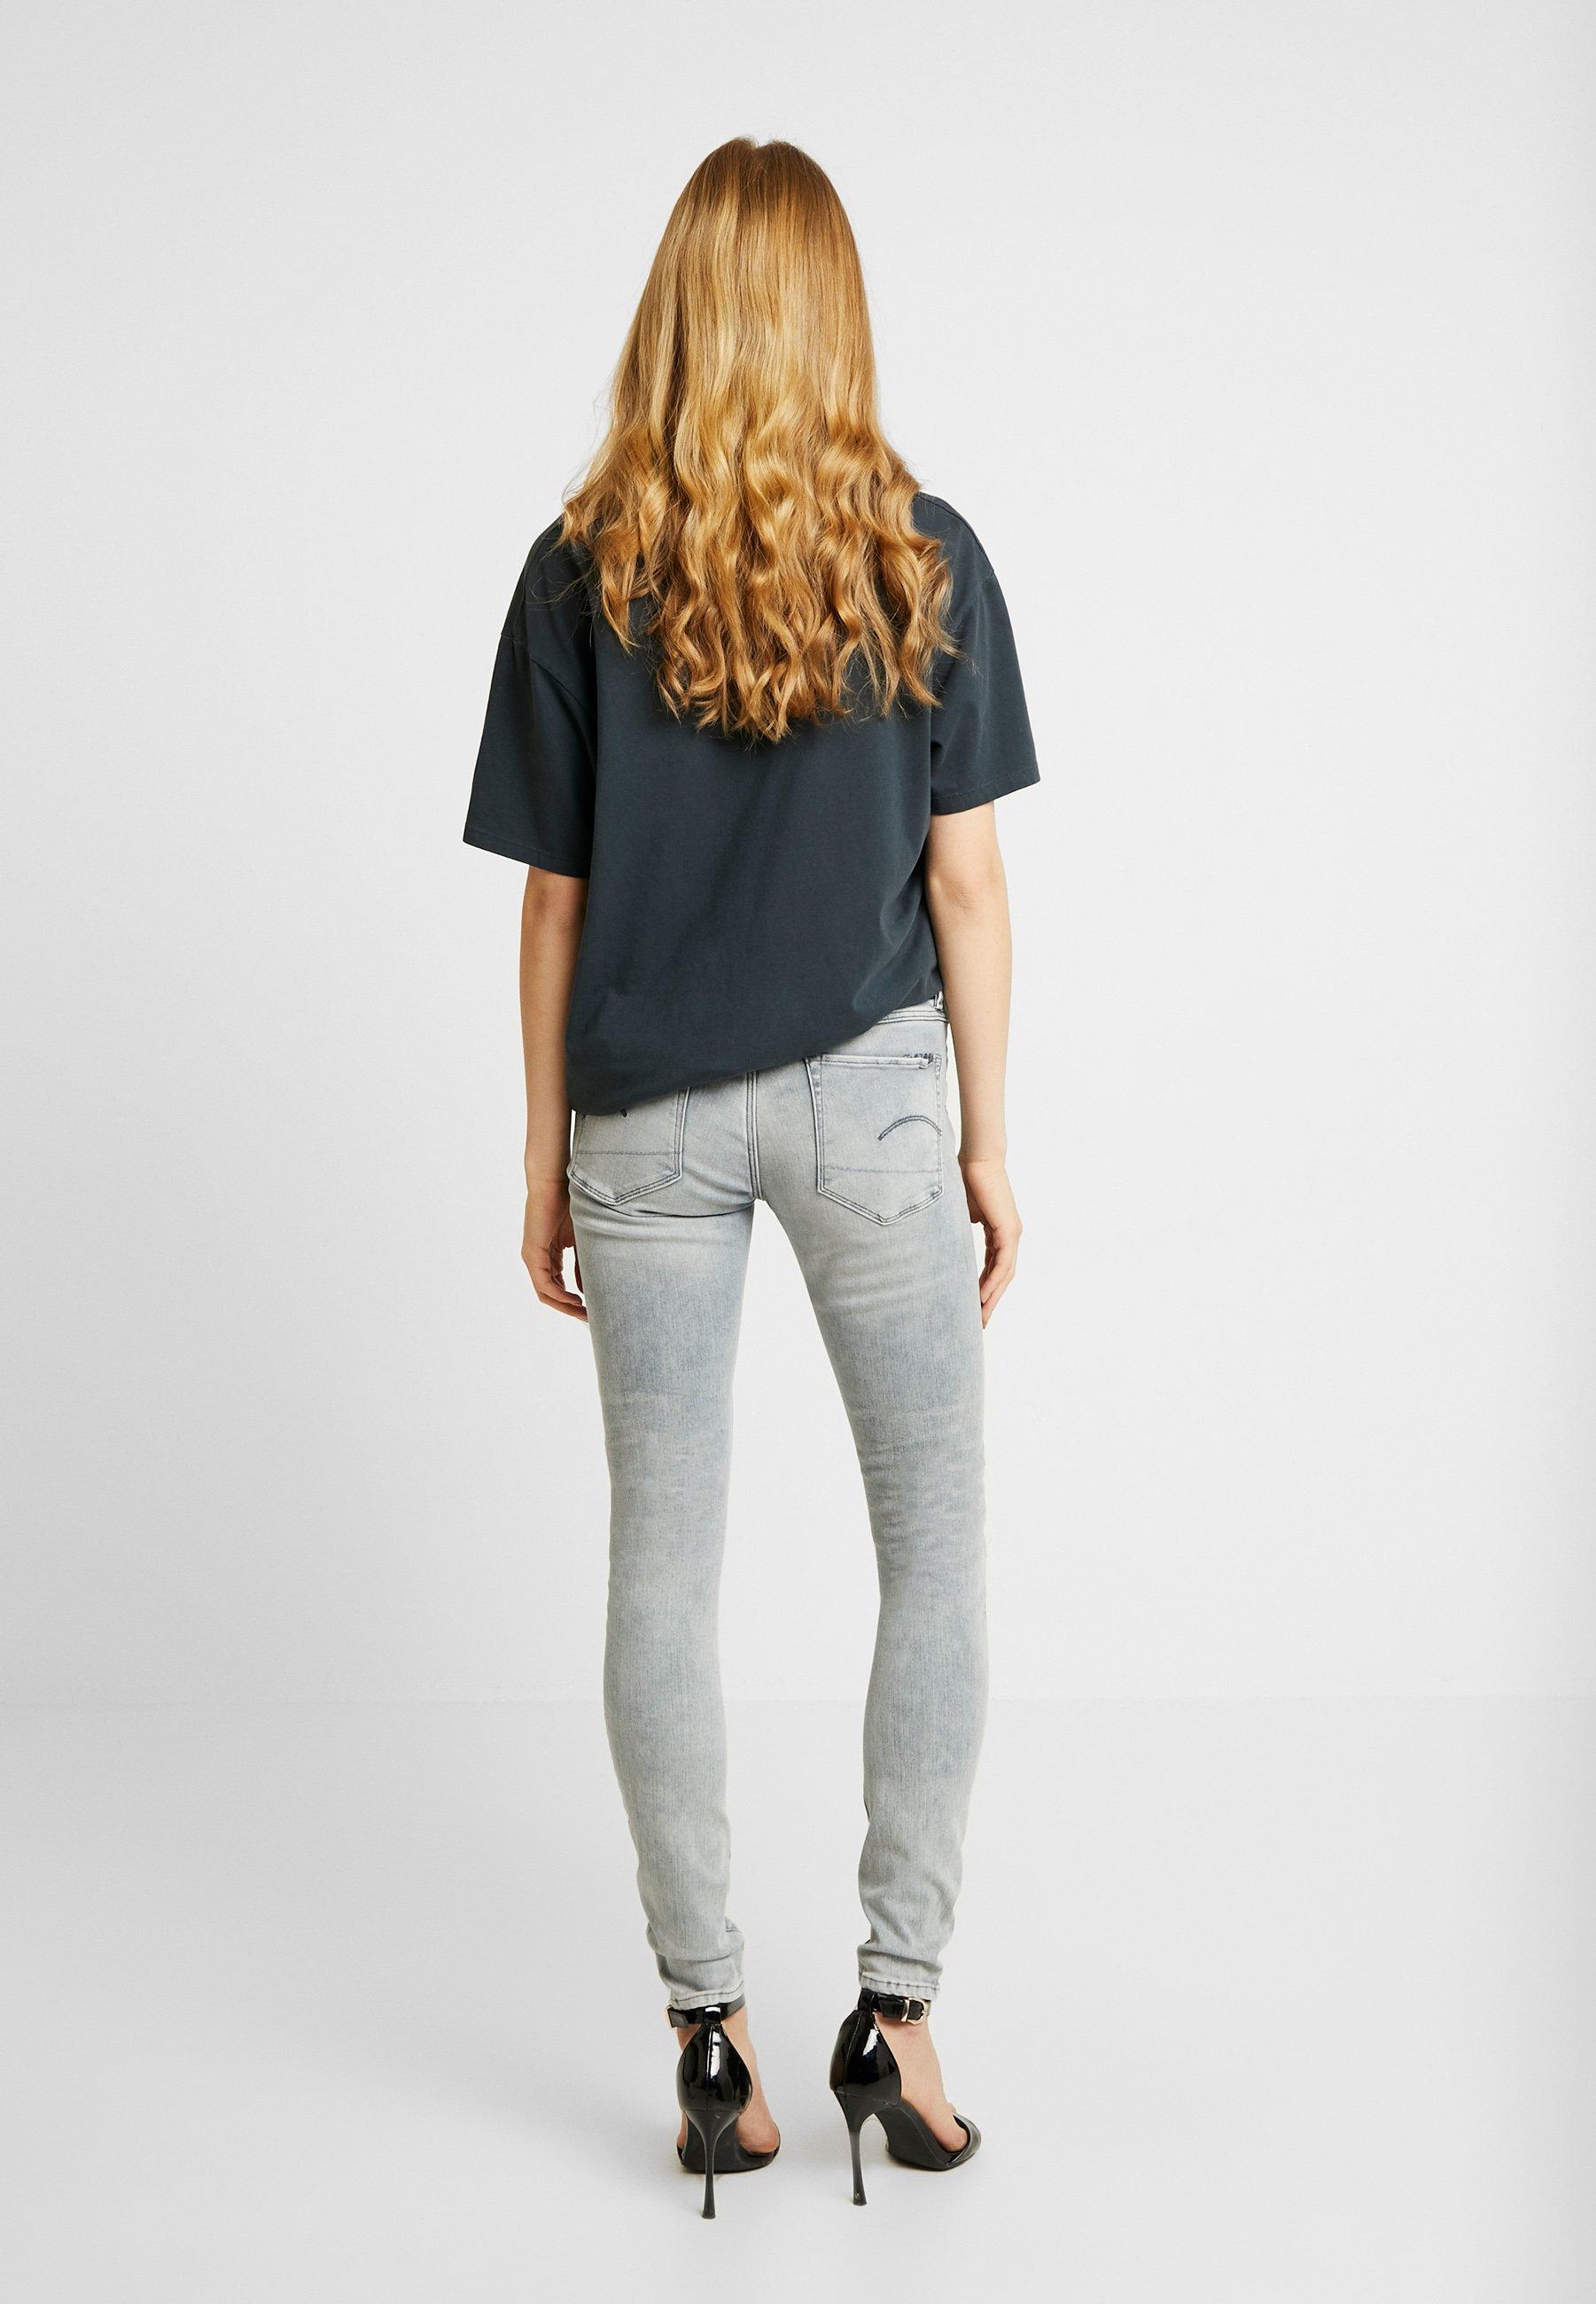 G-star 3301 Mid Skinny - Jeans Fit Sun Faded Grey